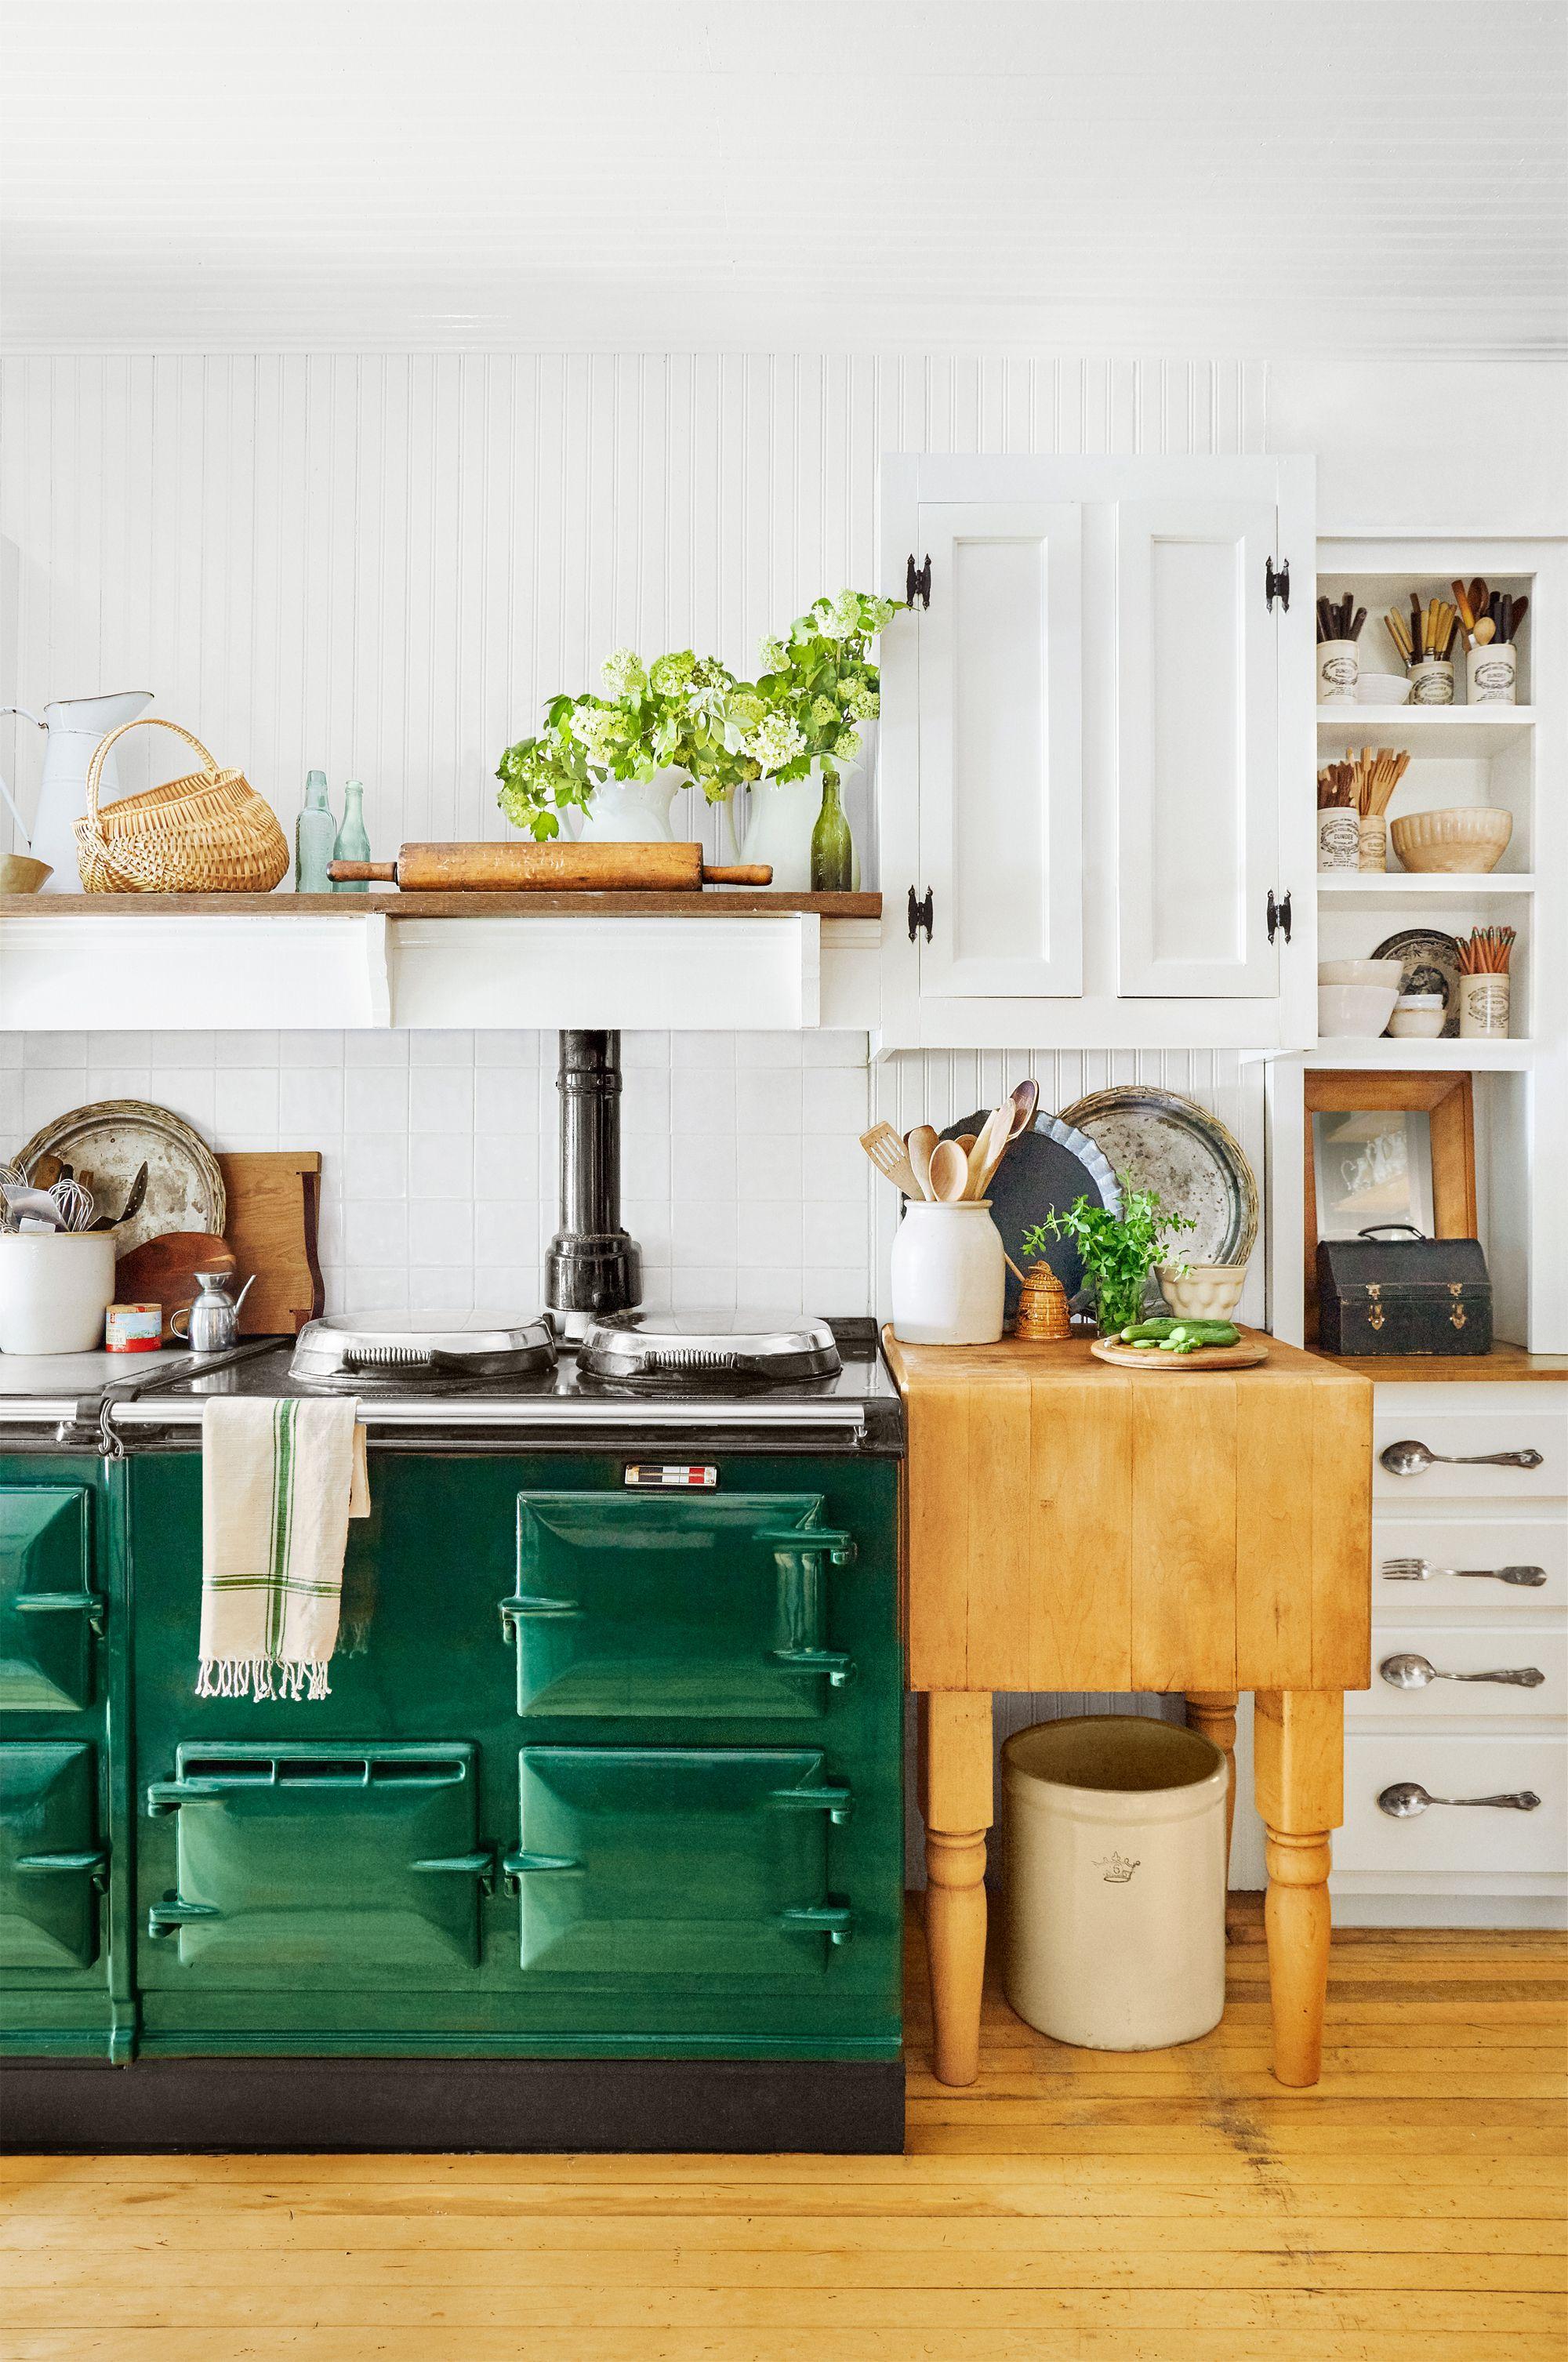 34 Farmhouse Style Kitchens   Rustic Decor Ideas for Kitchens 2000x3013